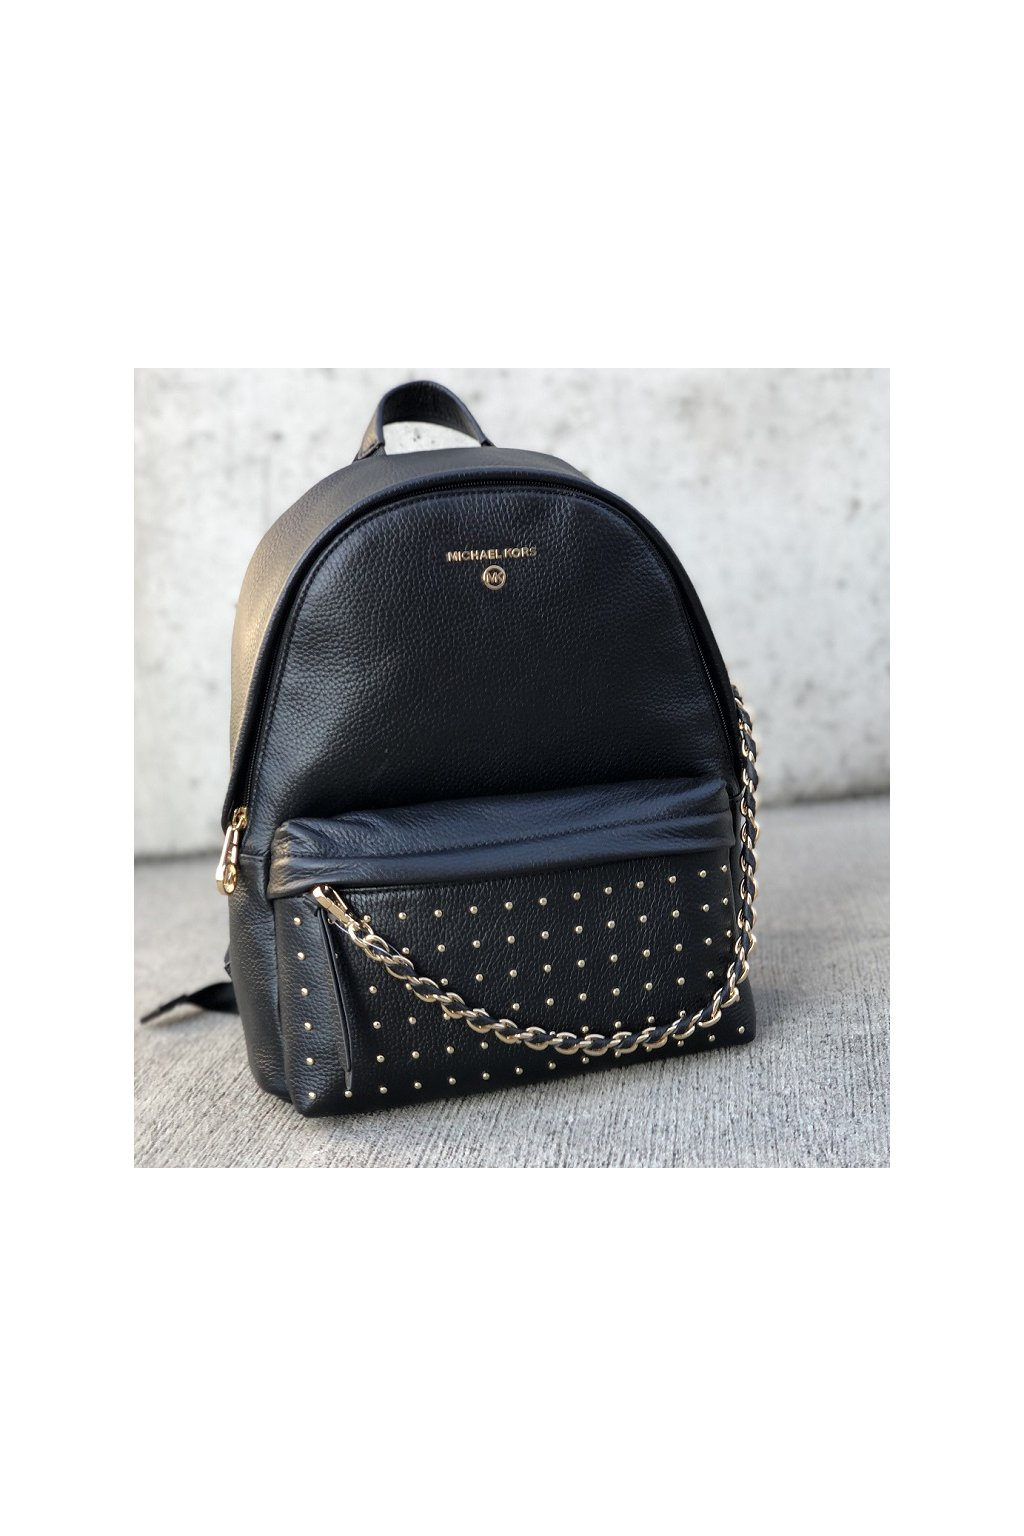 30F0G04B2I Black Dámský batoh Michael Kors Slater Medium Backpack Leather černý